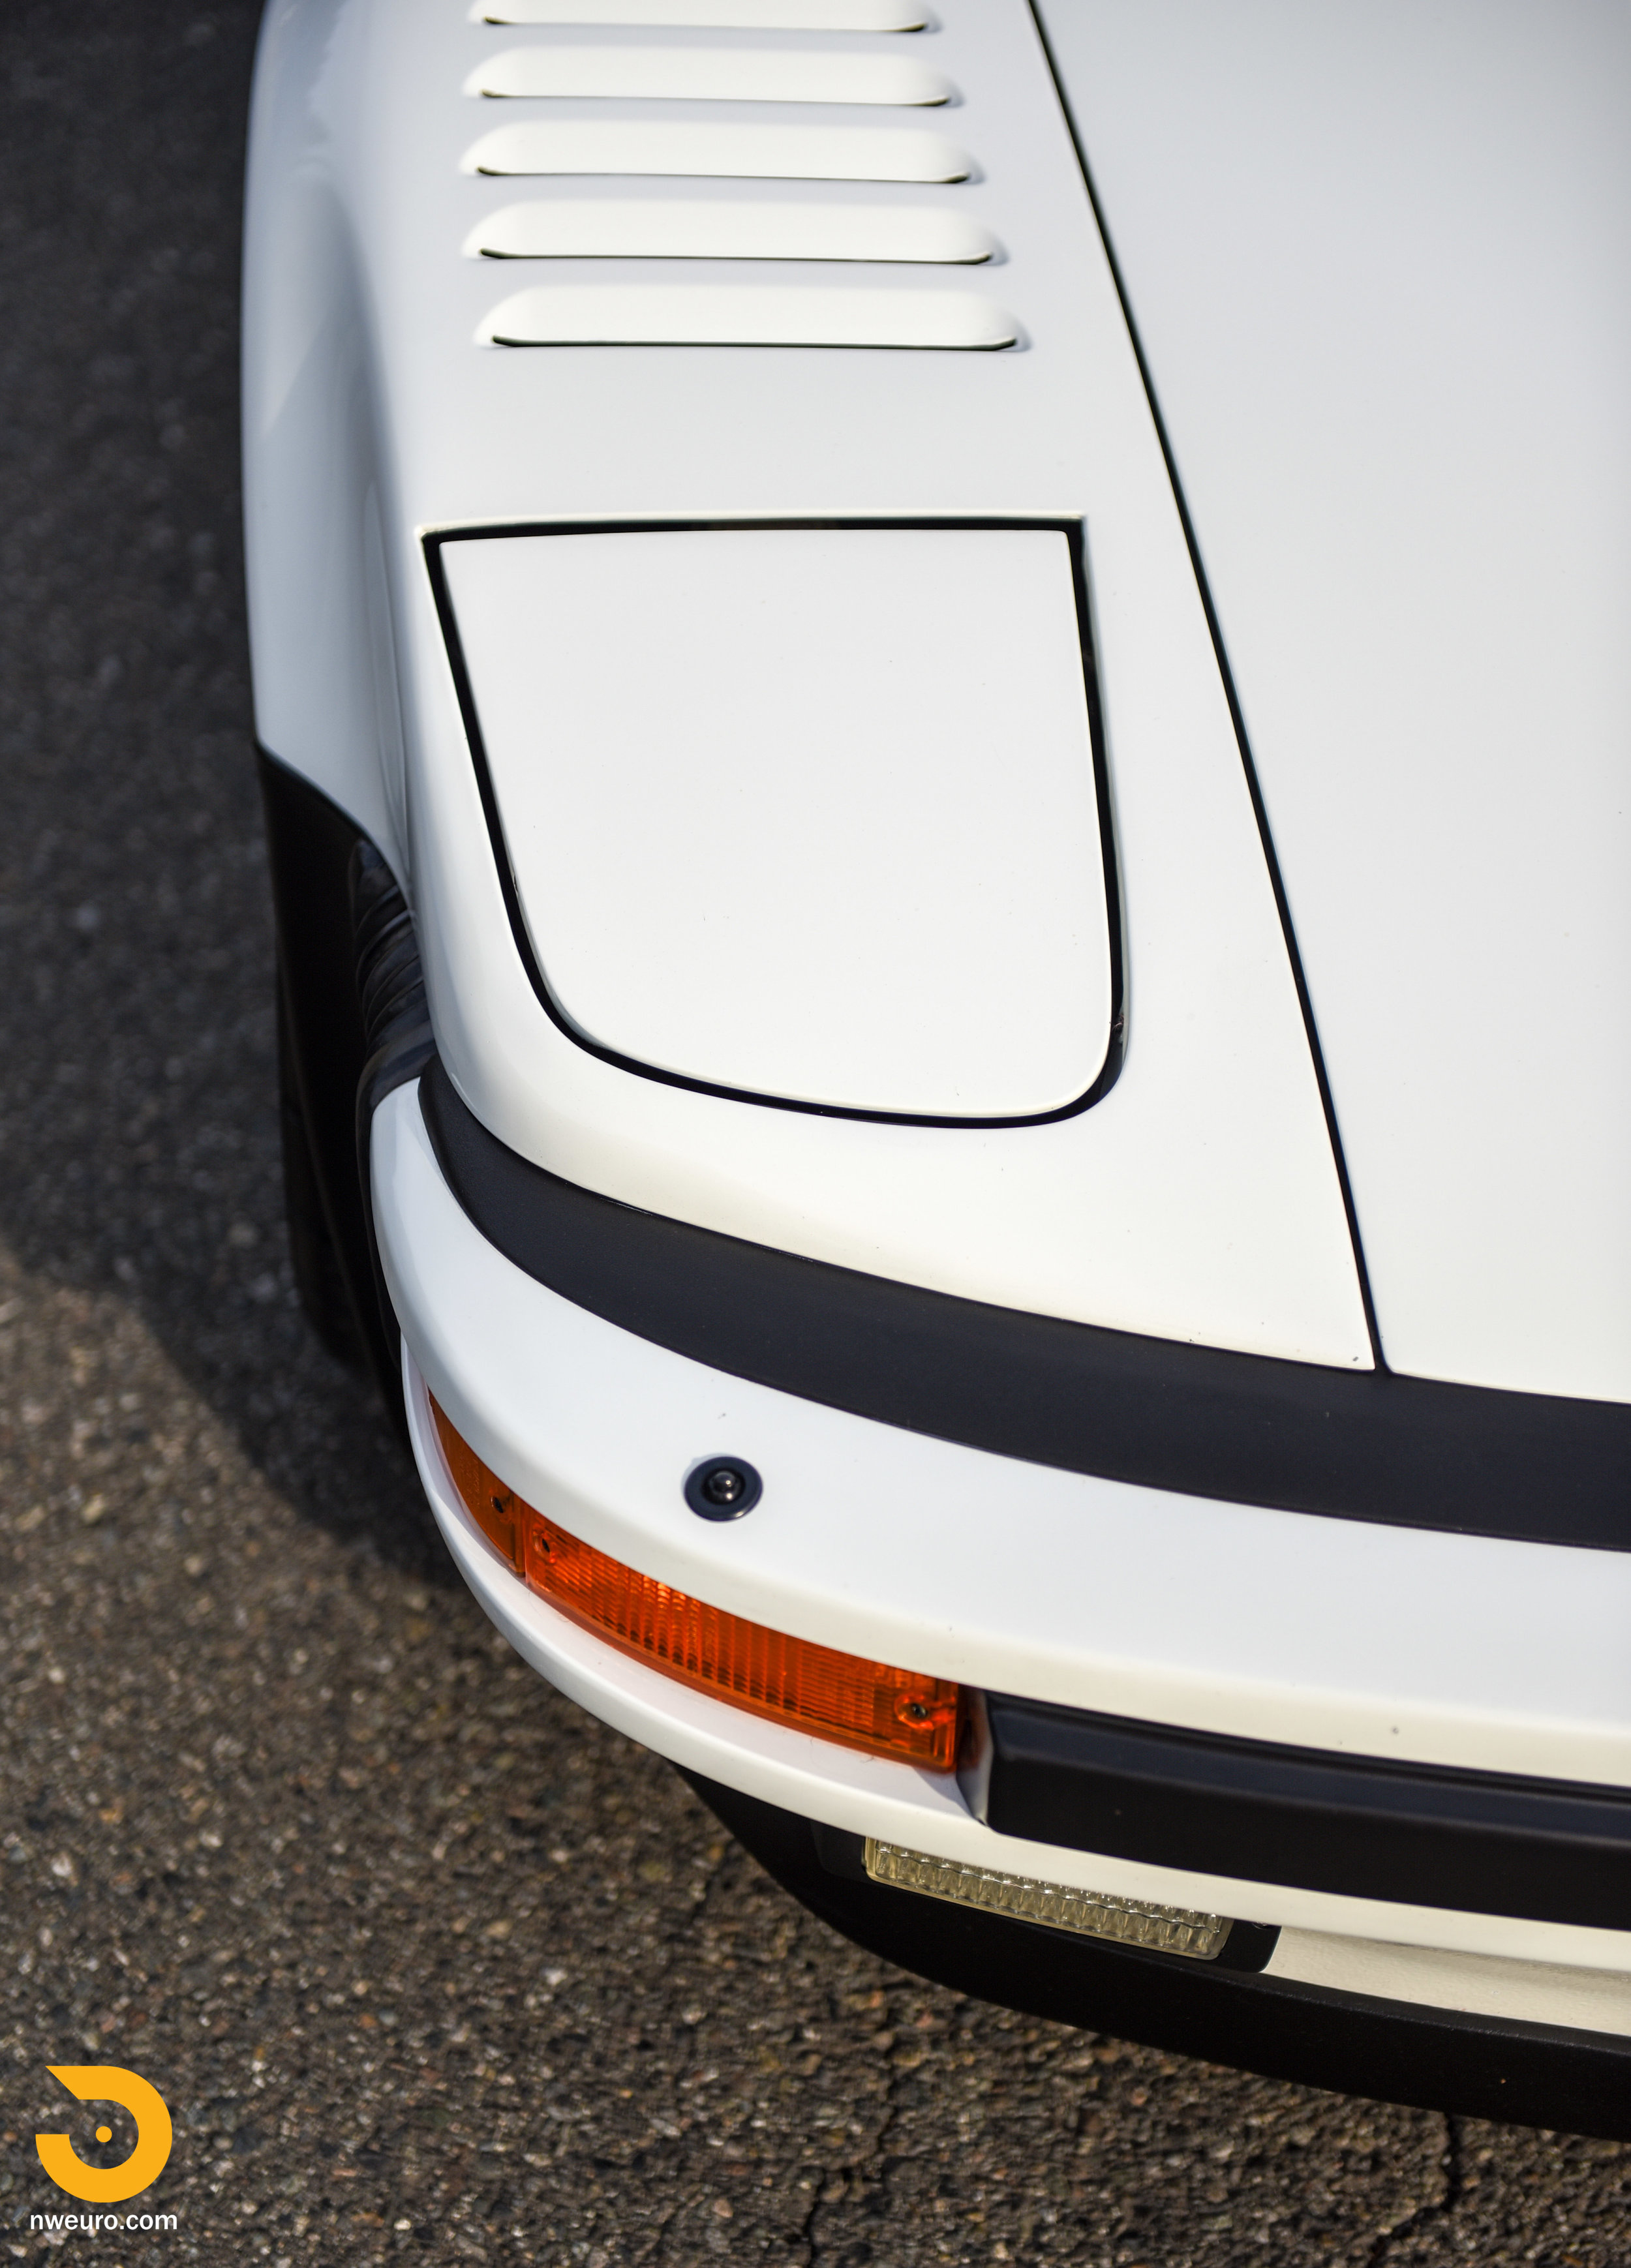 1987 Porsche 930 Slant Nose Cab-4.jpg